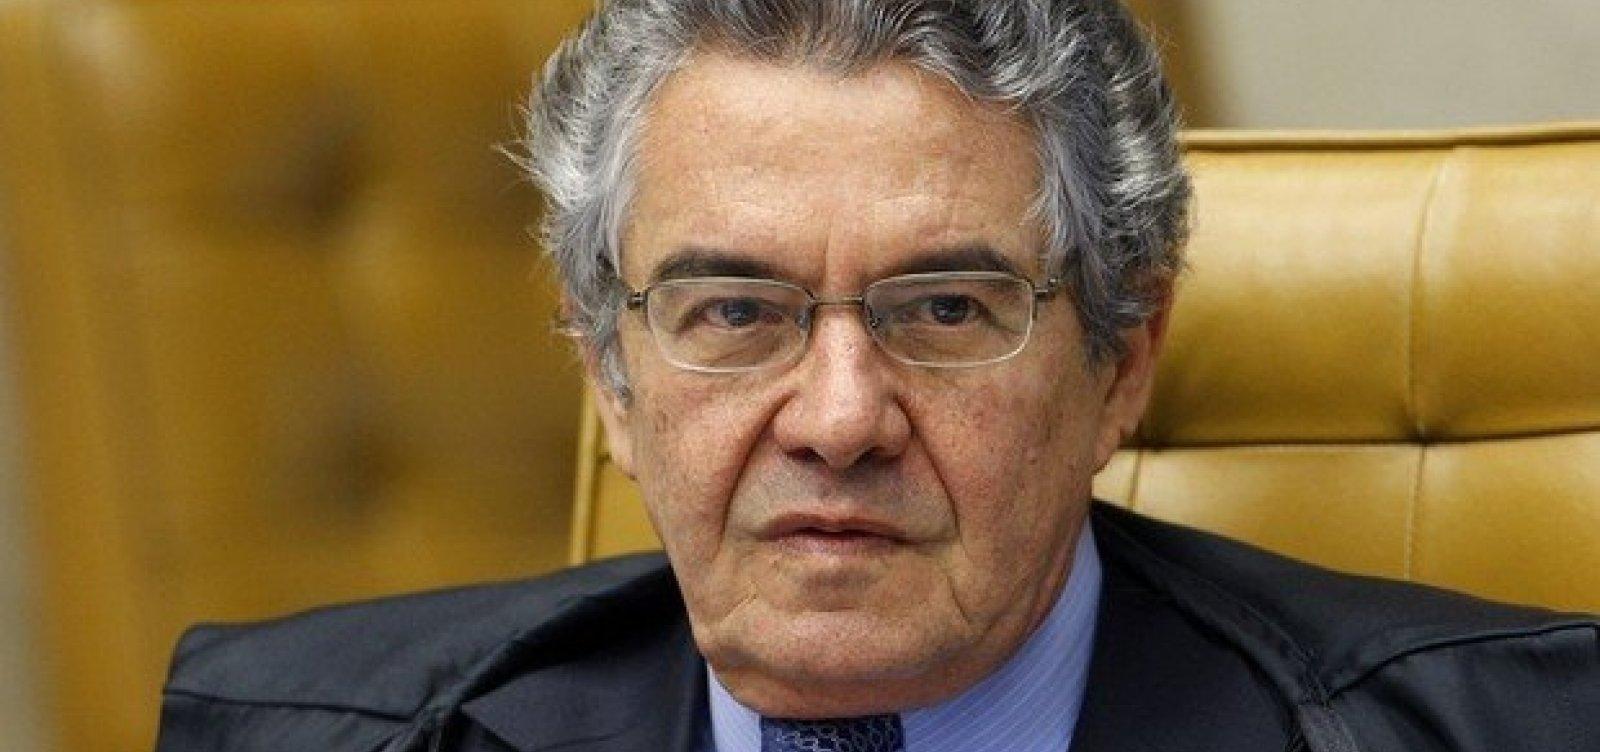 ['Ruim para ele, para Presidência e para STF', diz Mello sobre aceno de Bolsonaro a Moro]